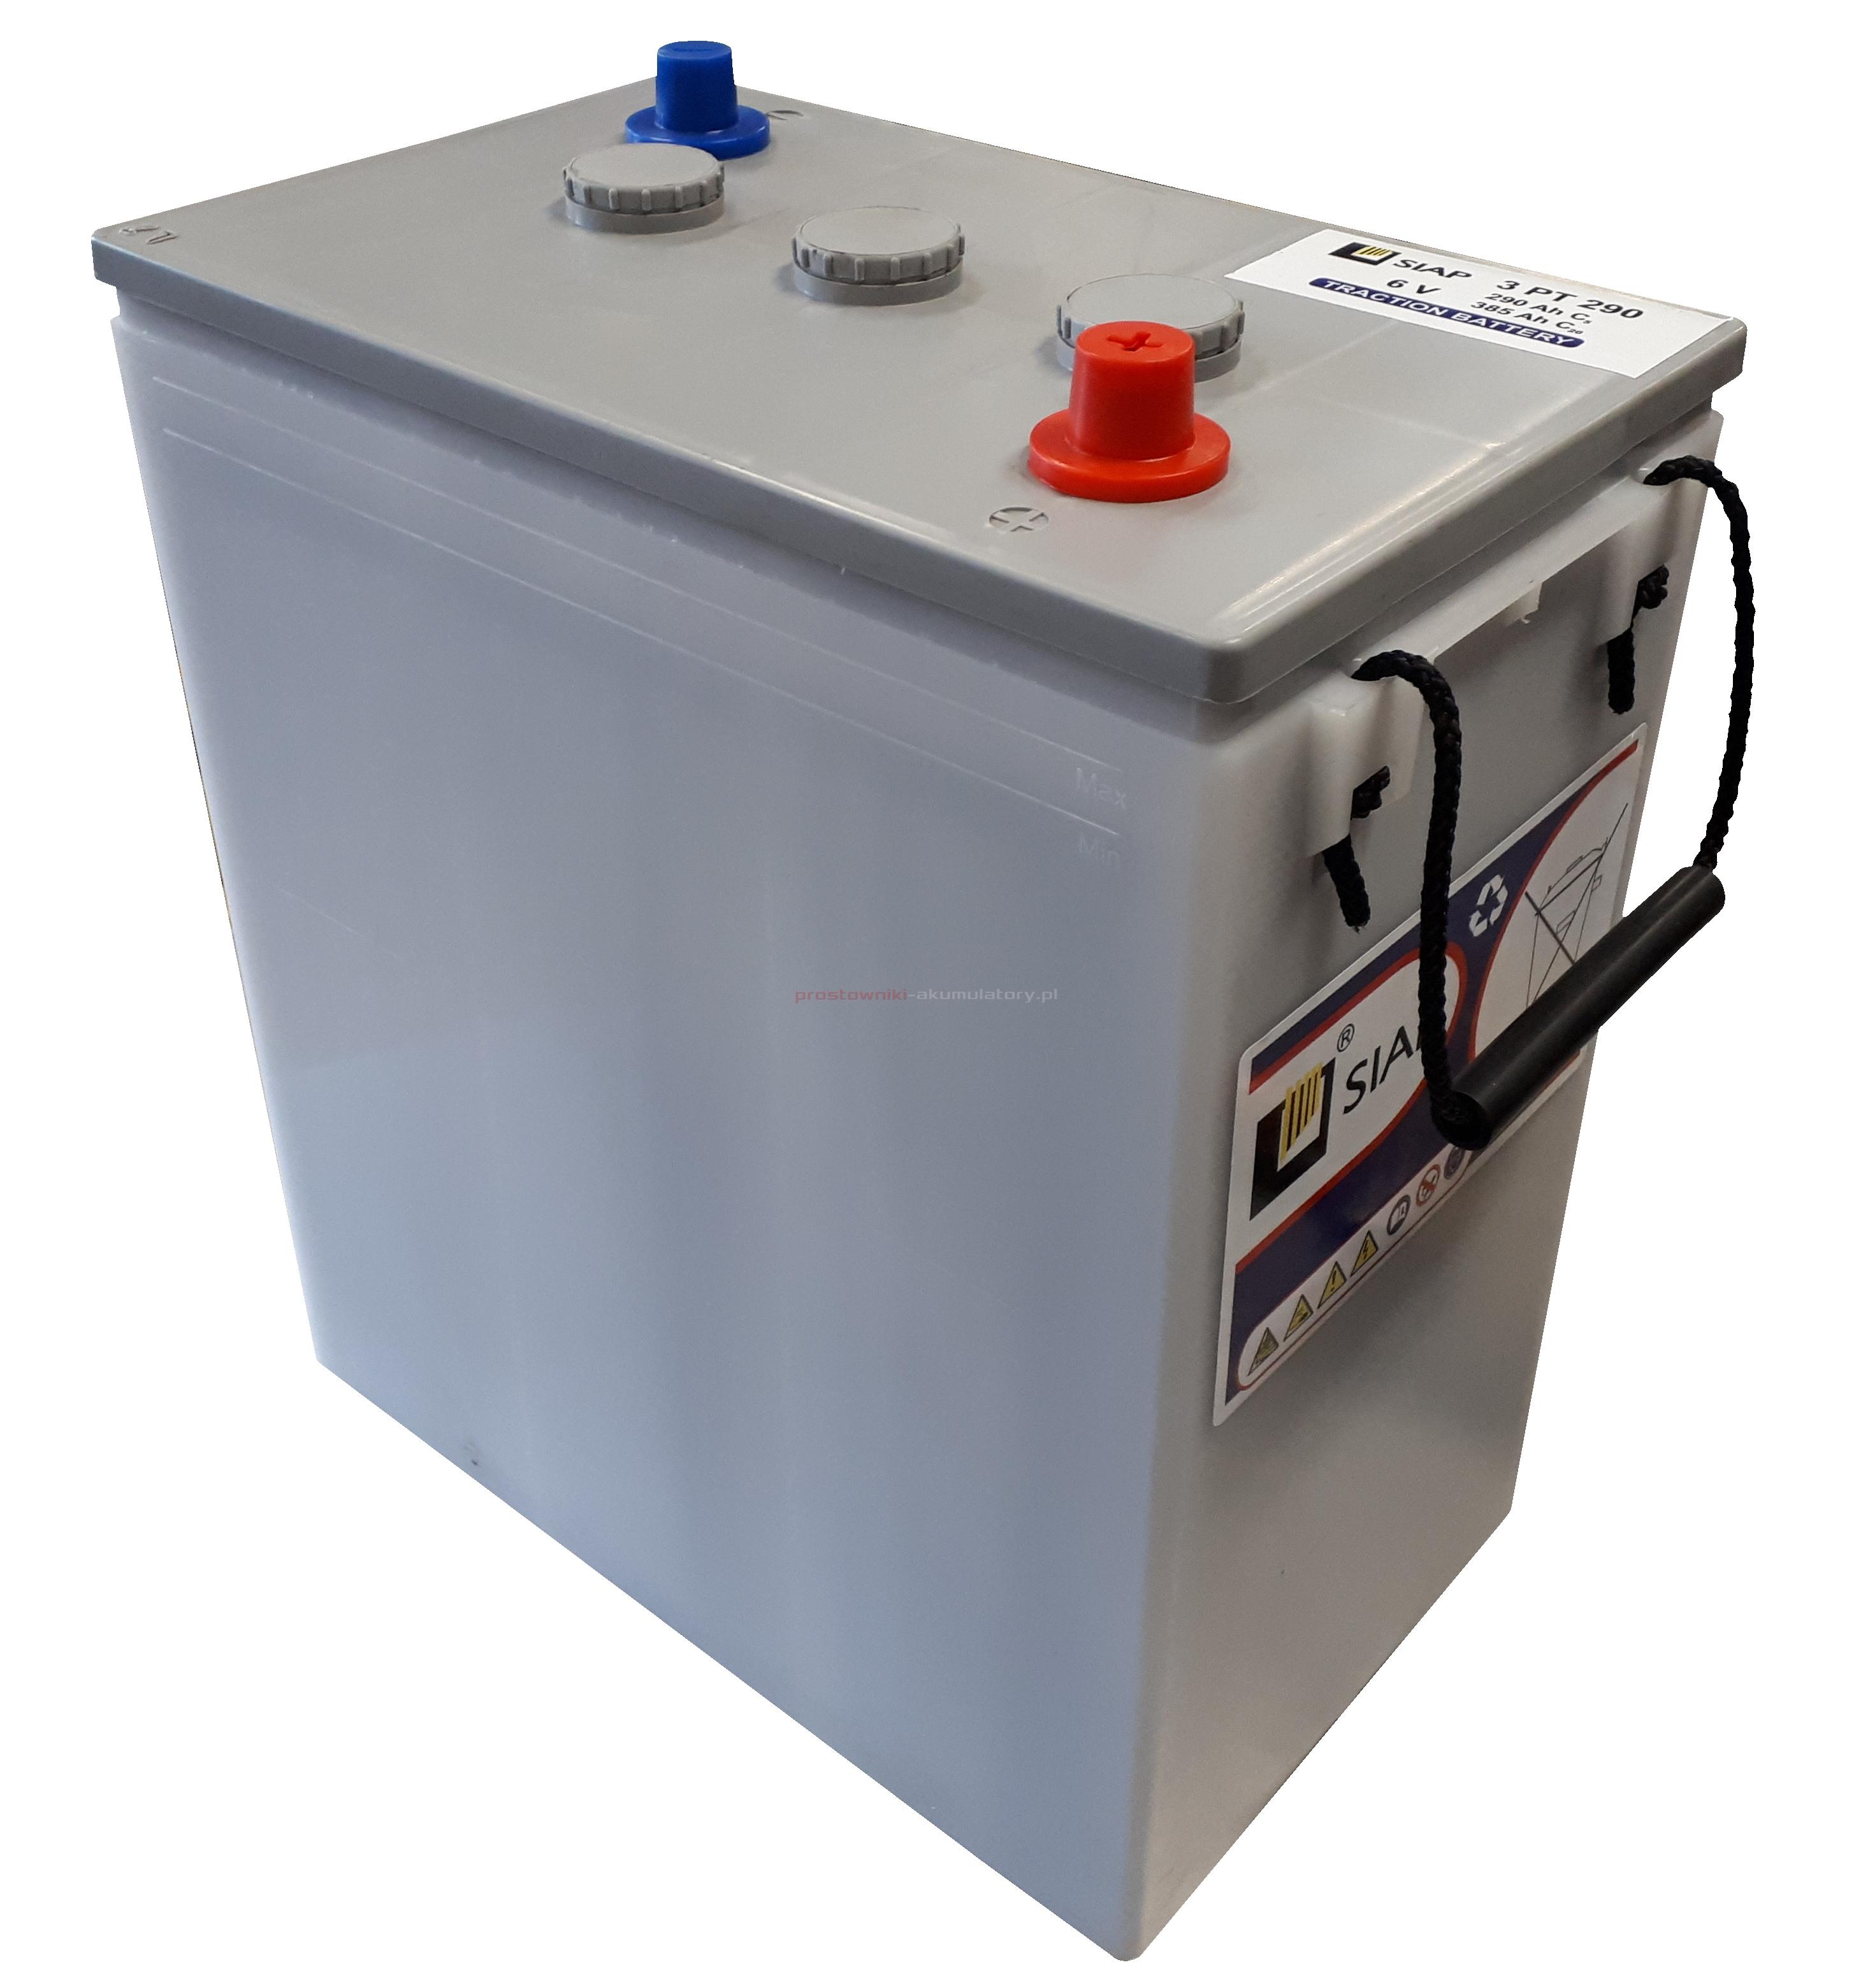 Akumulator 6V 385Ah (20H) SIAP 3PT290 pancerna płyta